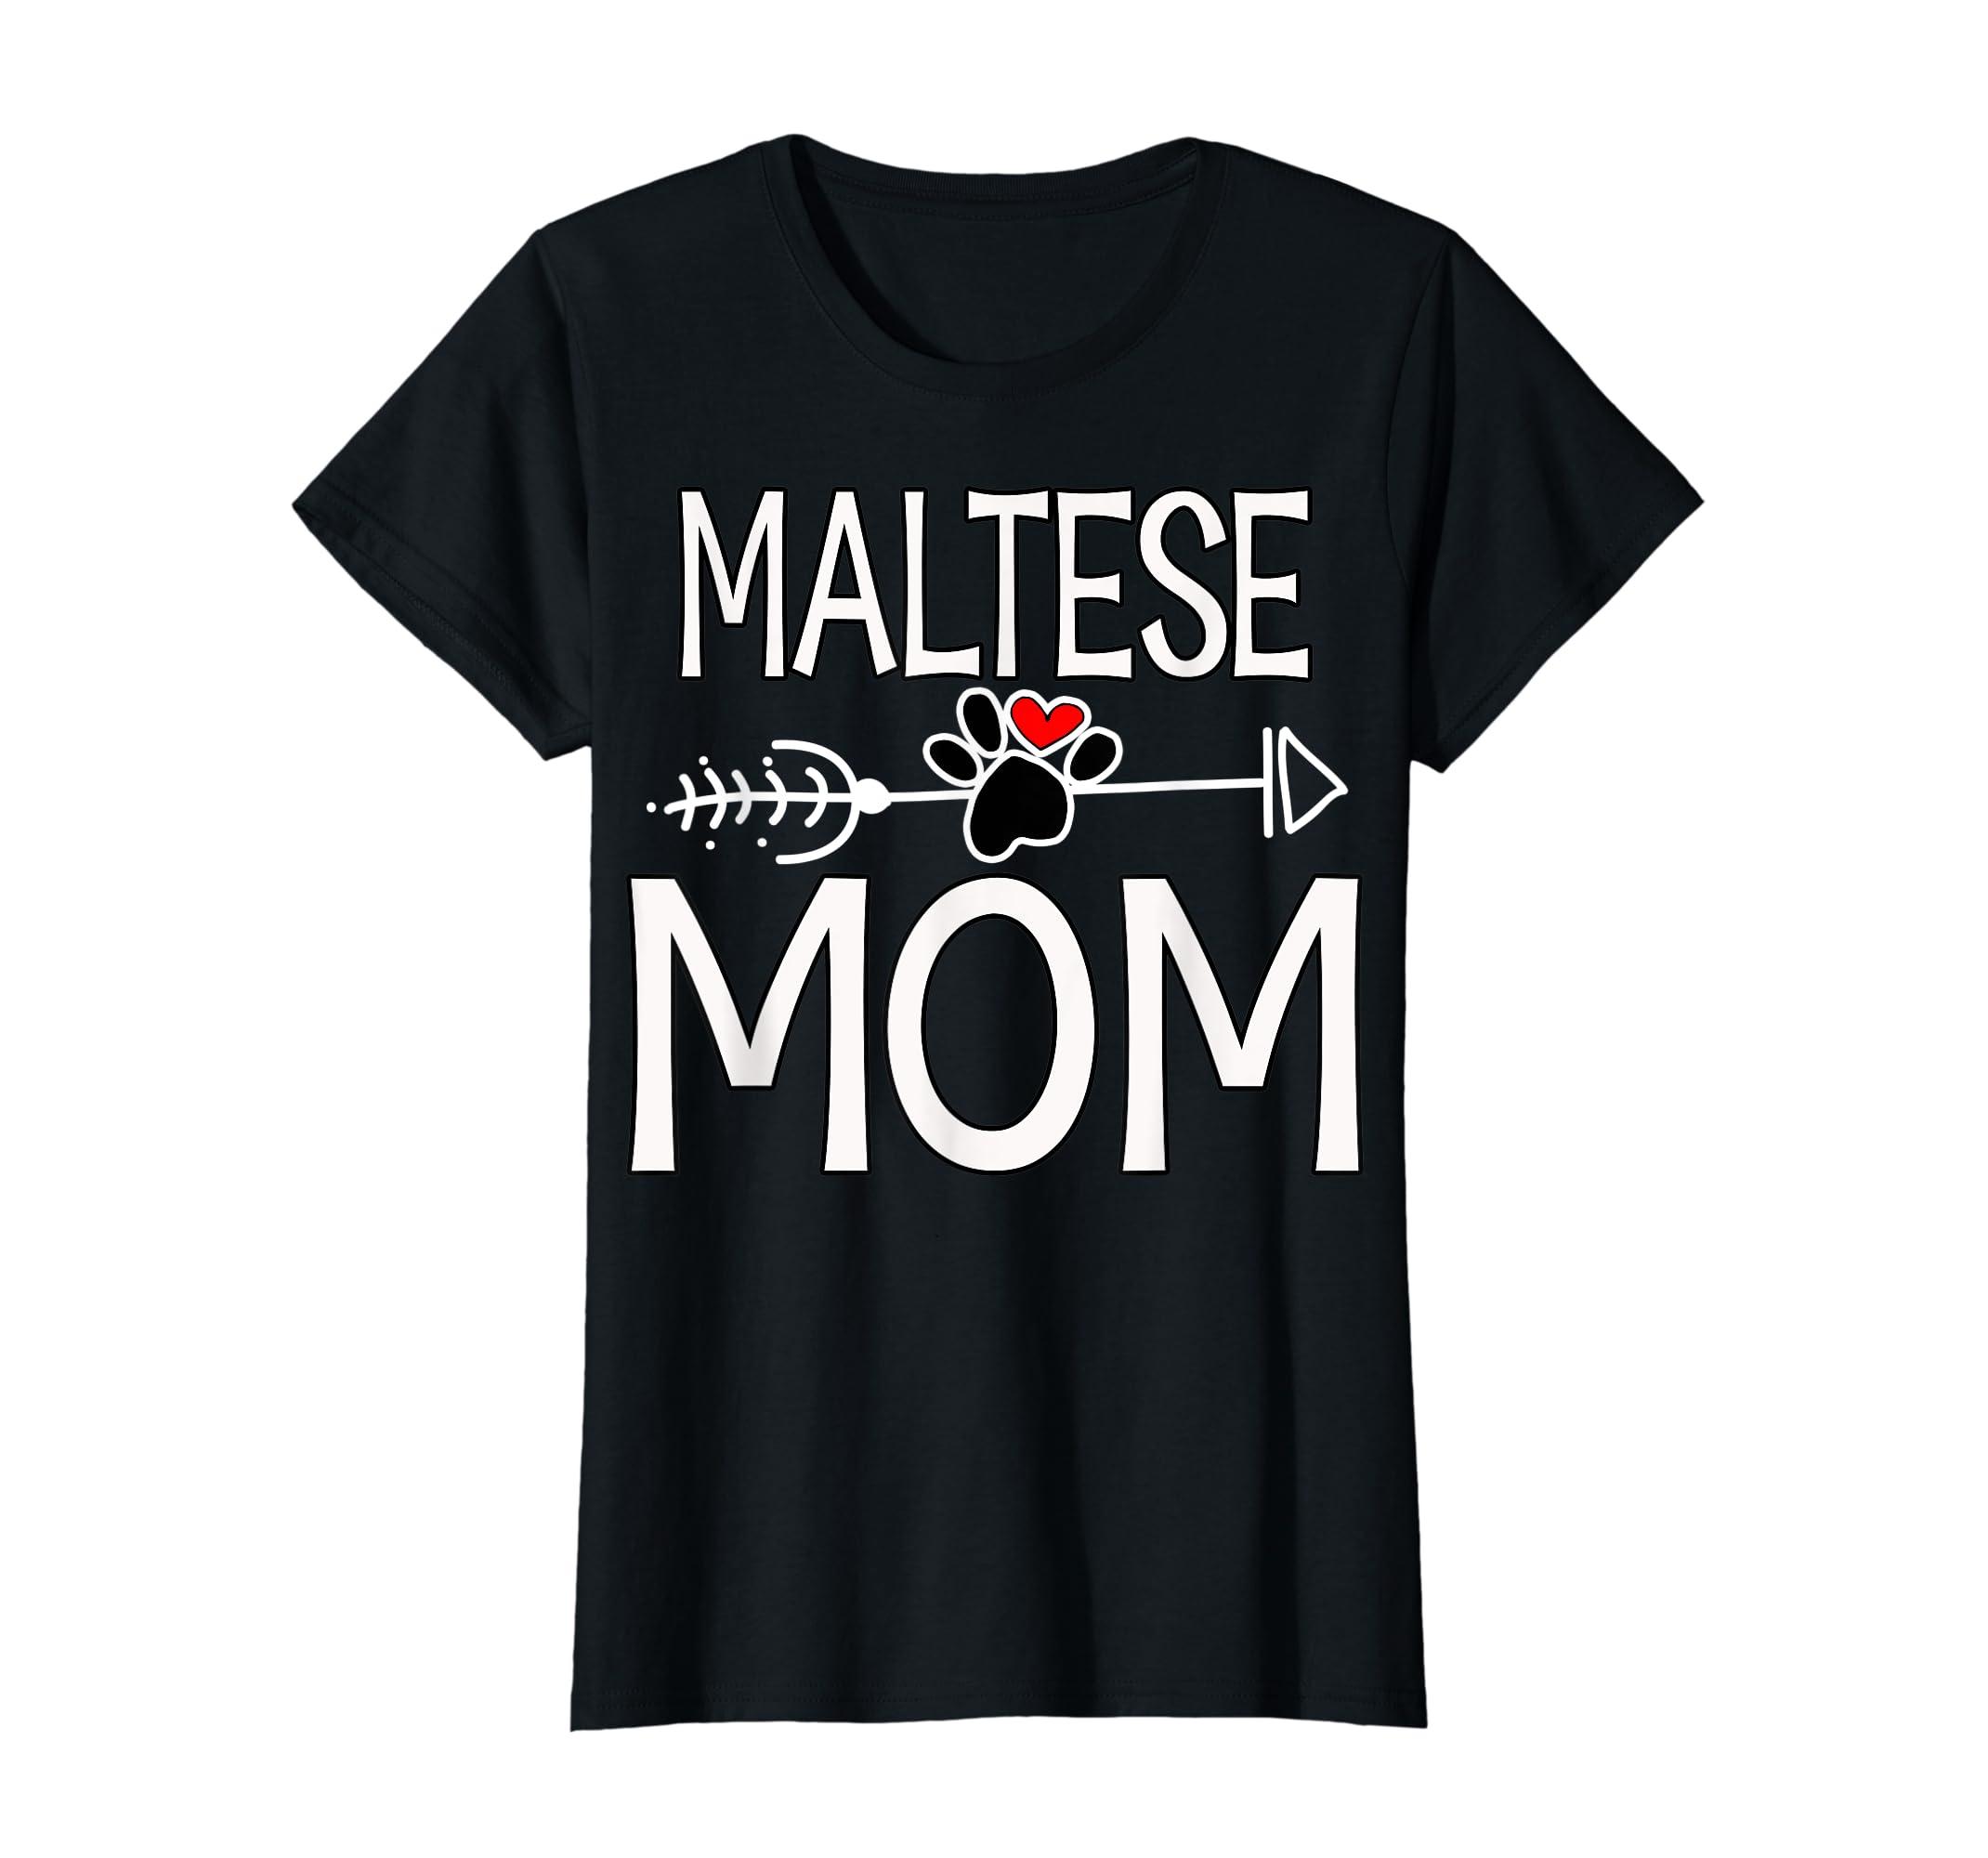 Maltese Mom T-Shirt Dog Lover Mother's Day Gifts-Women's T-Shirt-Black